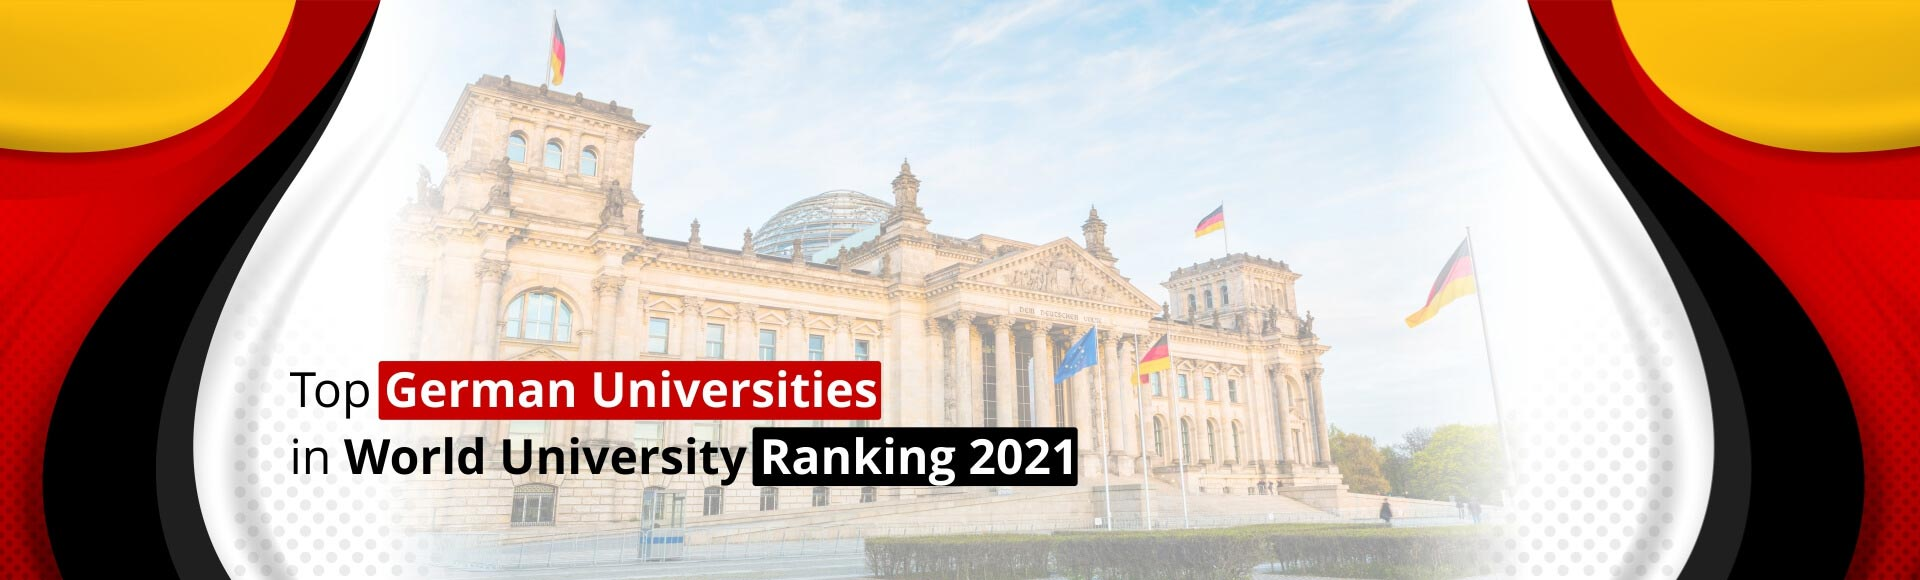 Top German Universities in World University Ranking 2021